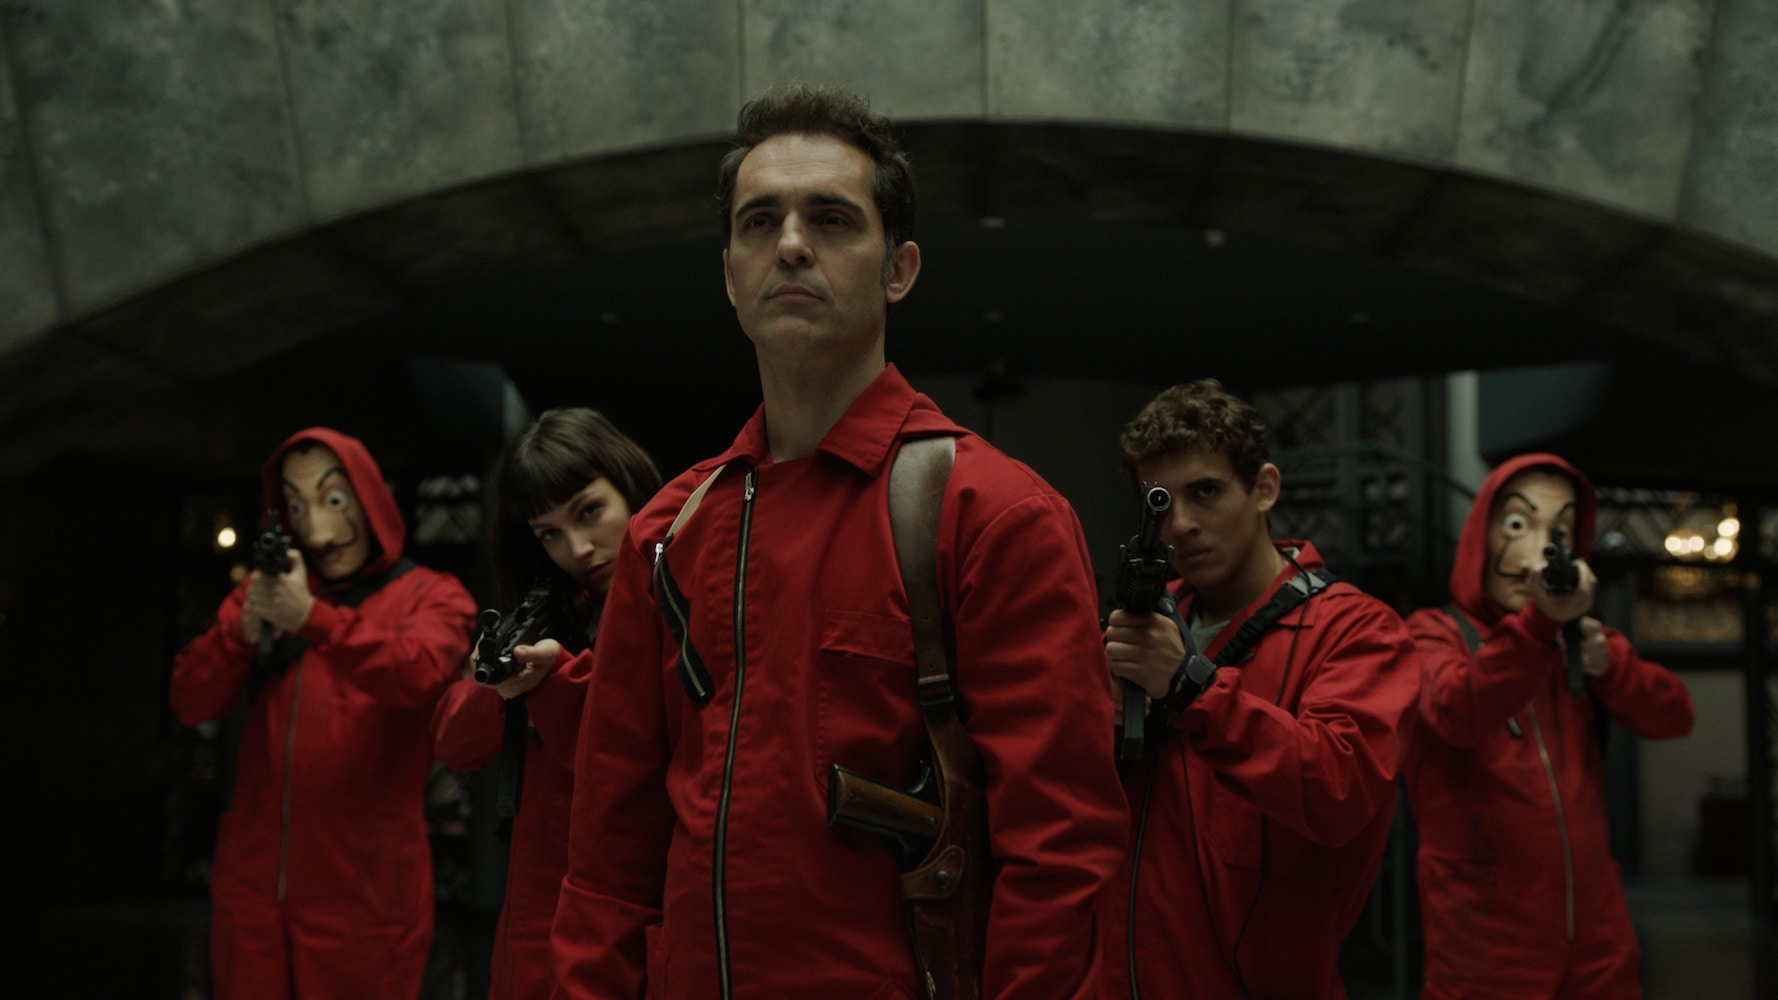 TEASER: Netflix Confirms Spanish Series 'La Casa de Papel' Is Filming Season 3